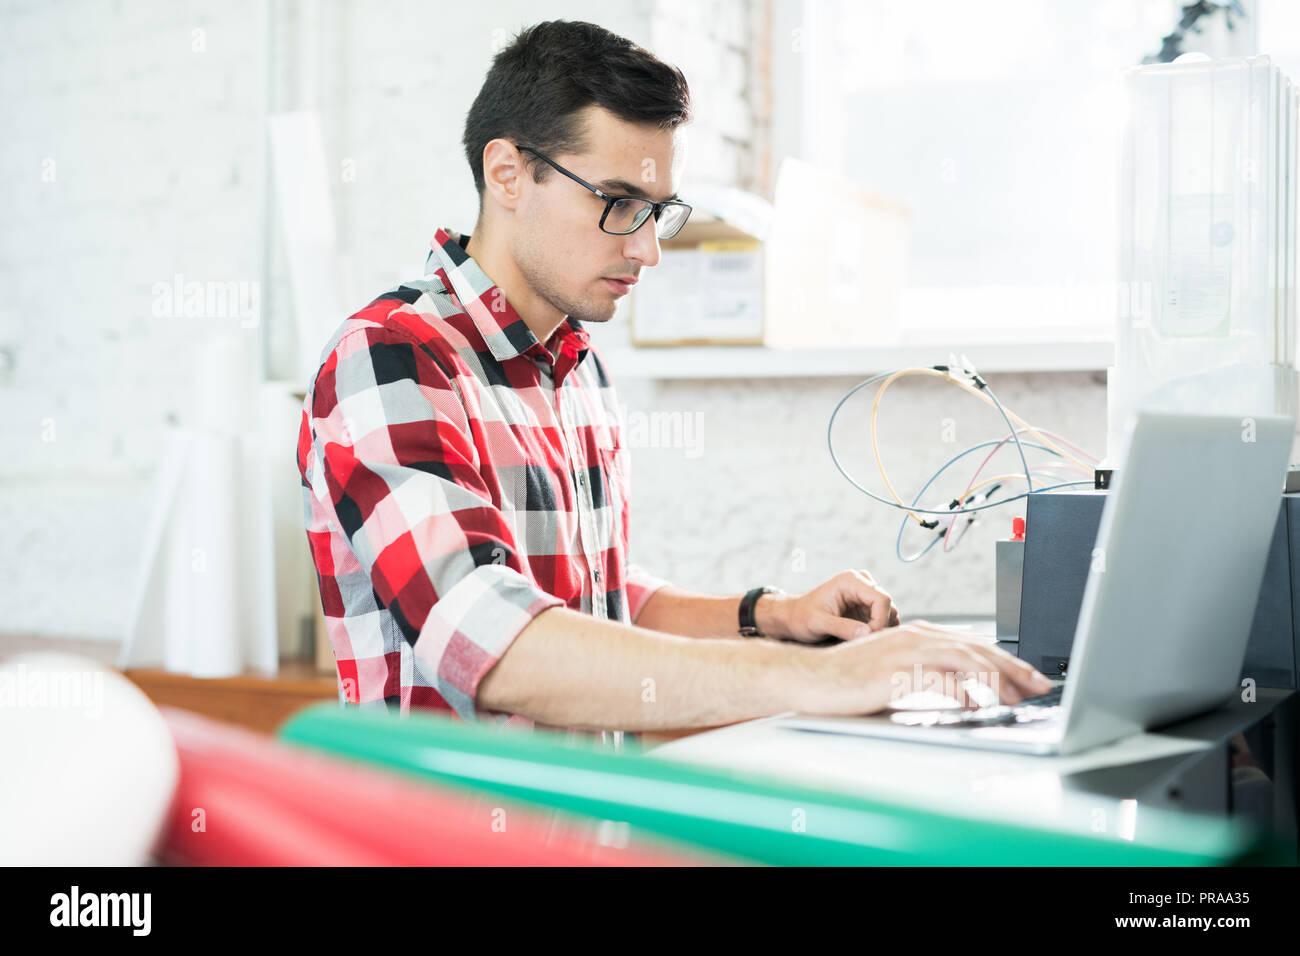 Serious technician testing printer on laptop - Stock Image